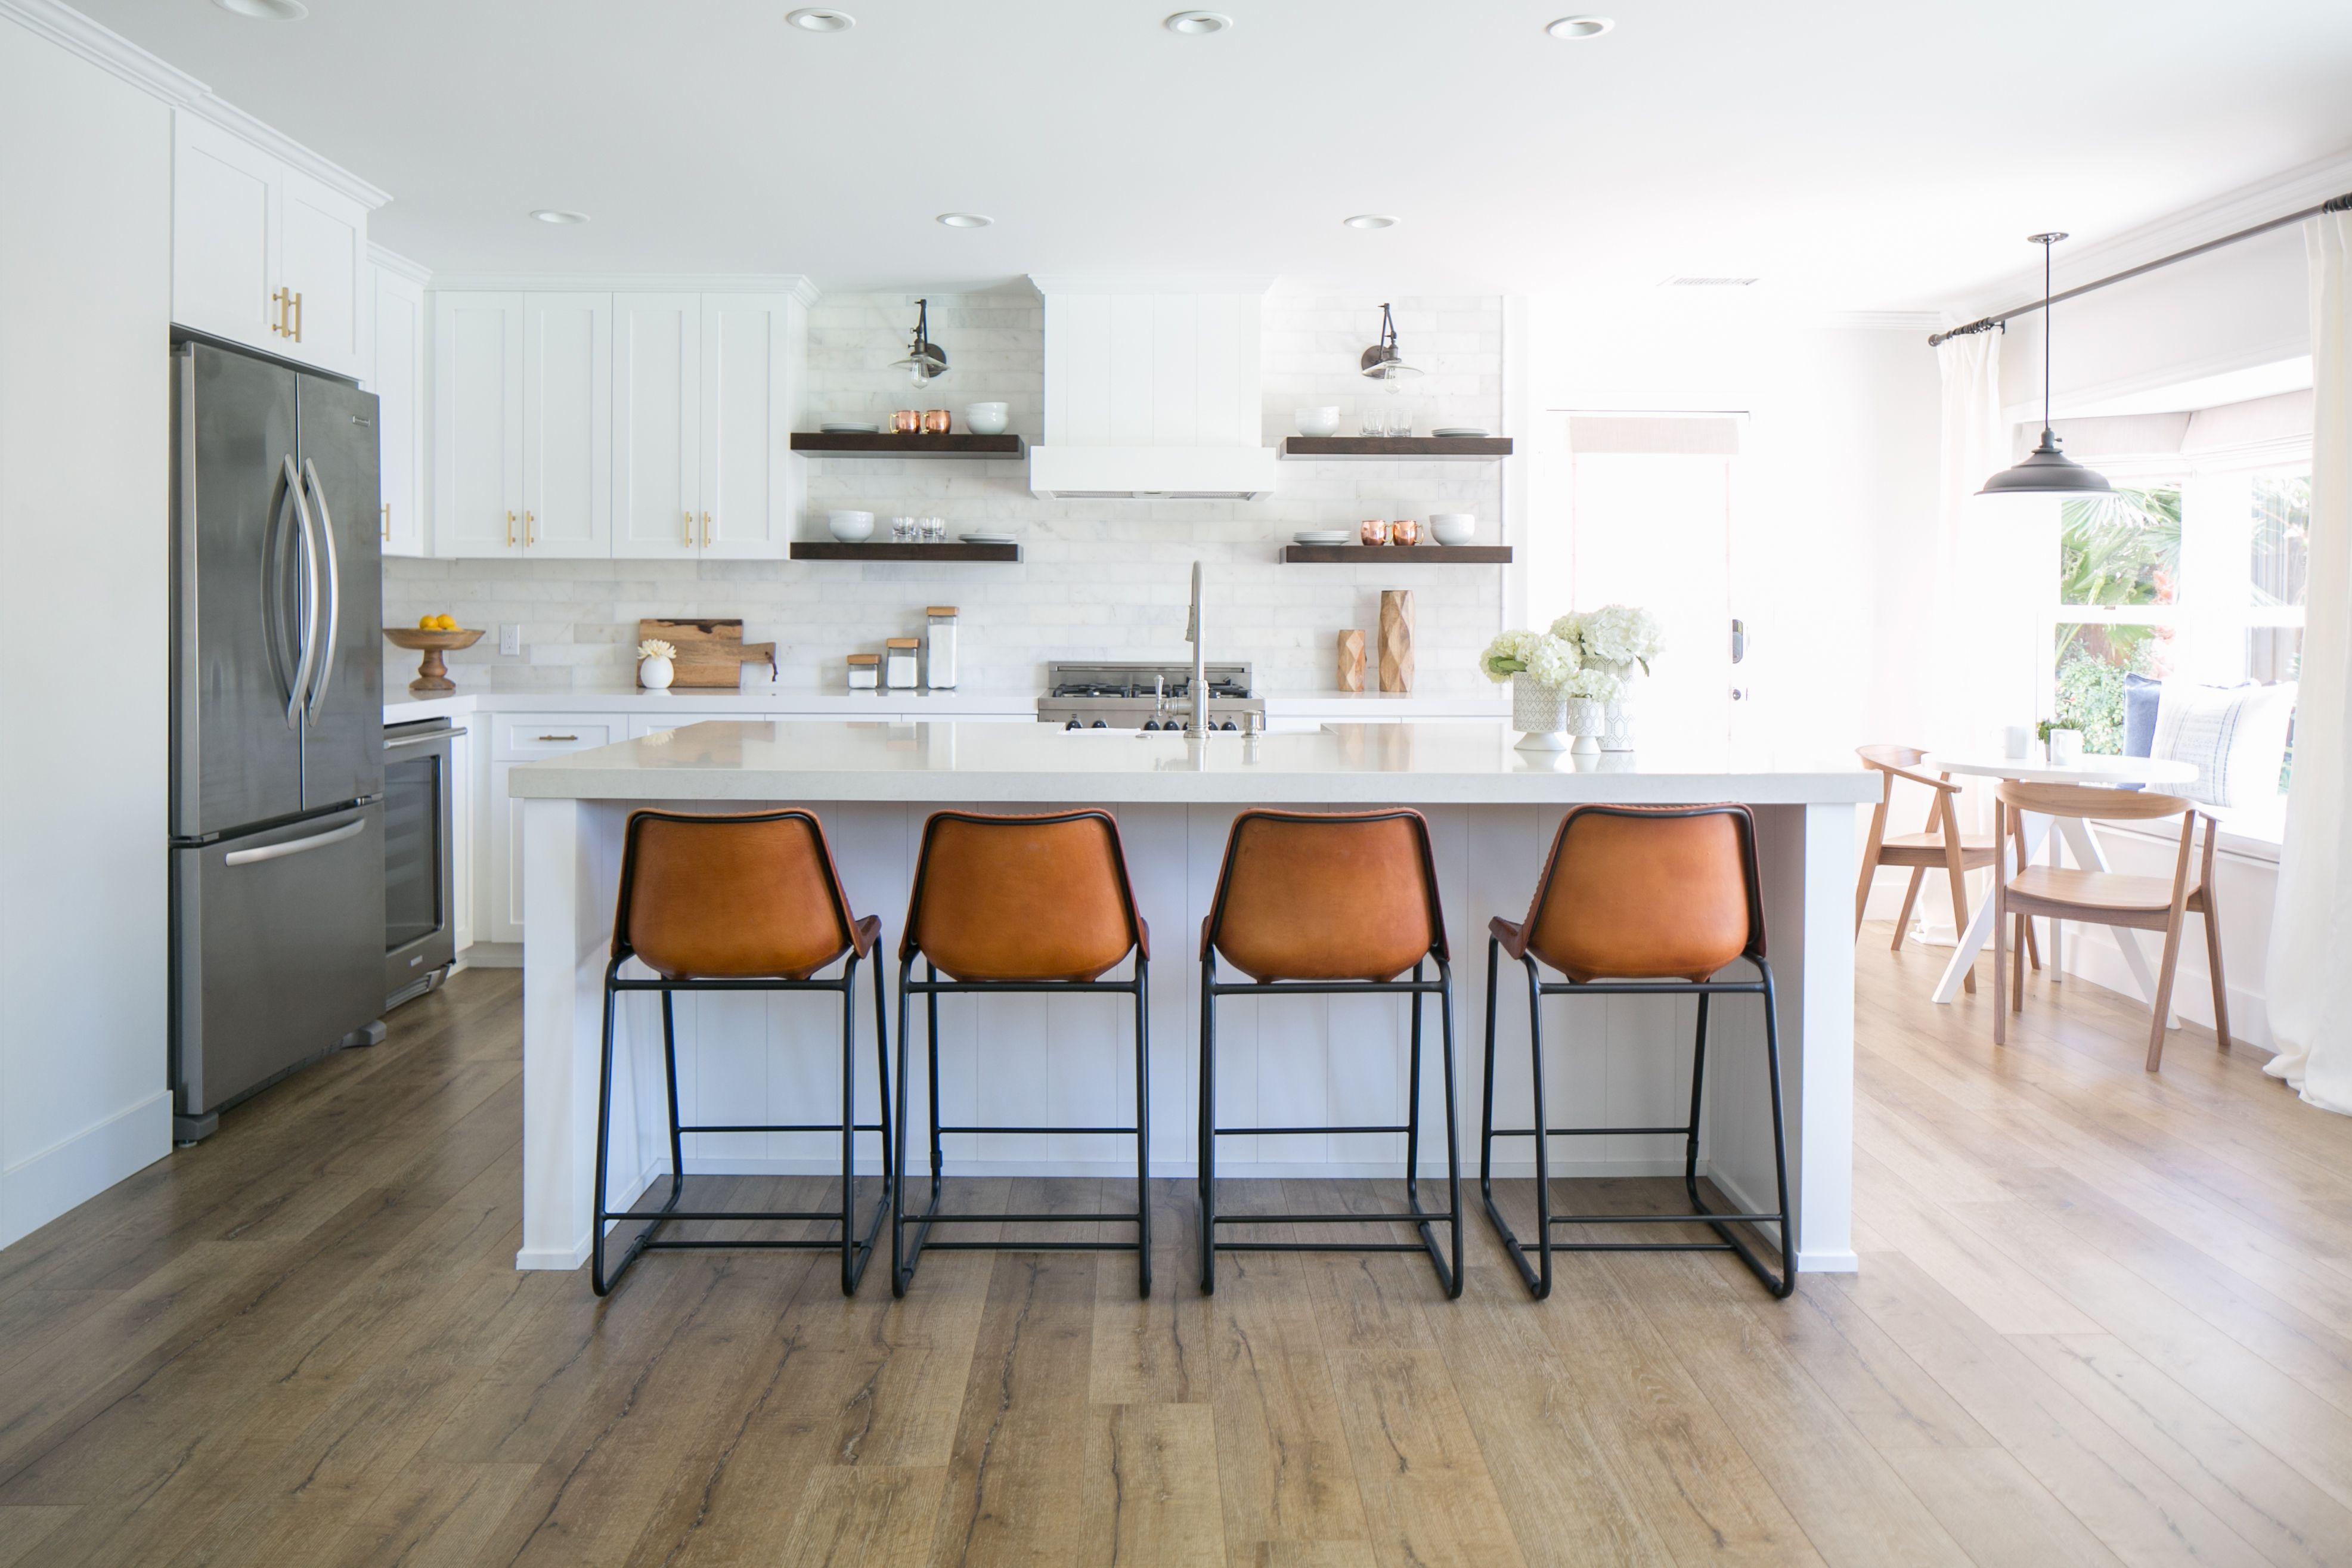 Modern farmhouse interior design by lindye galloway design white